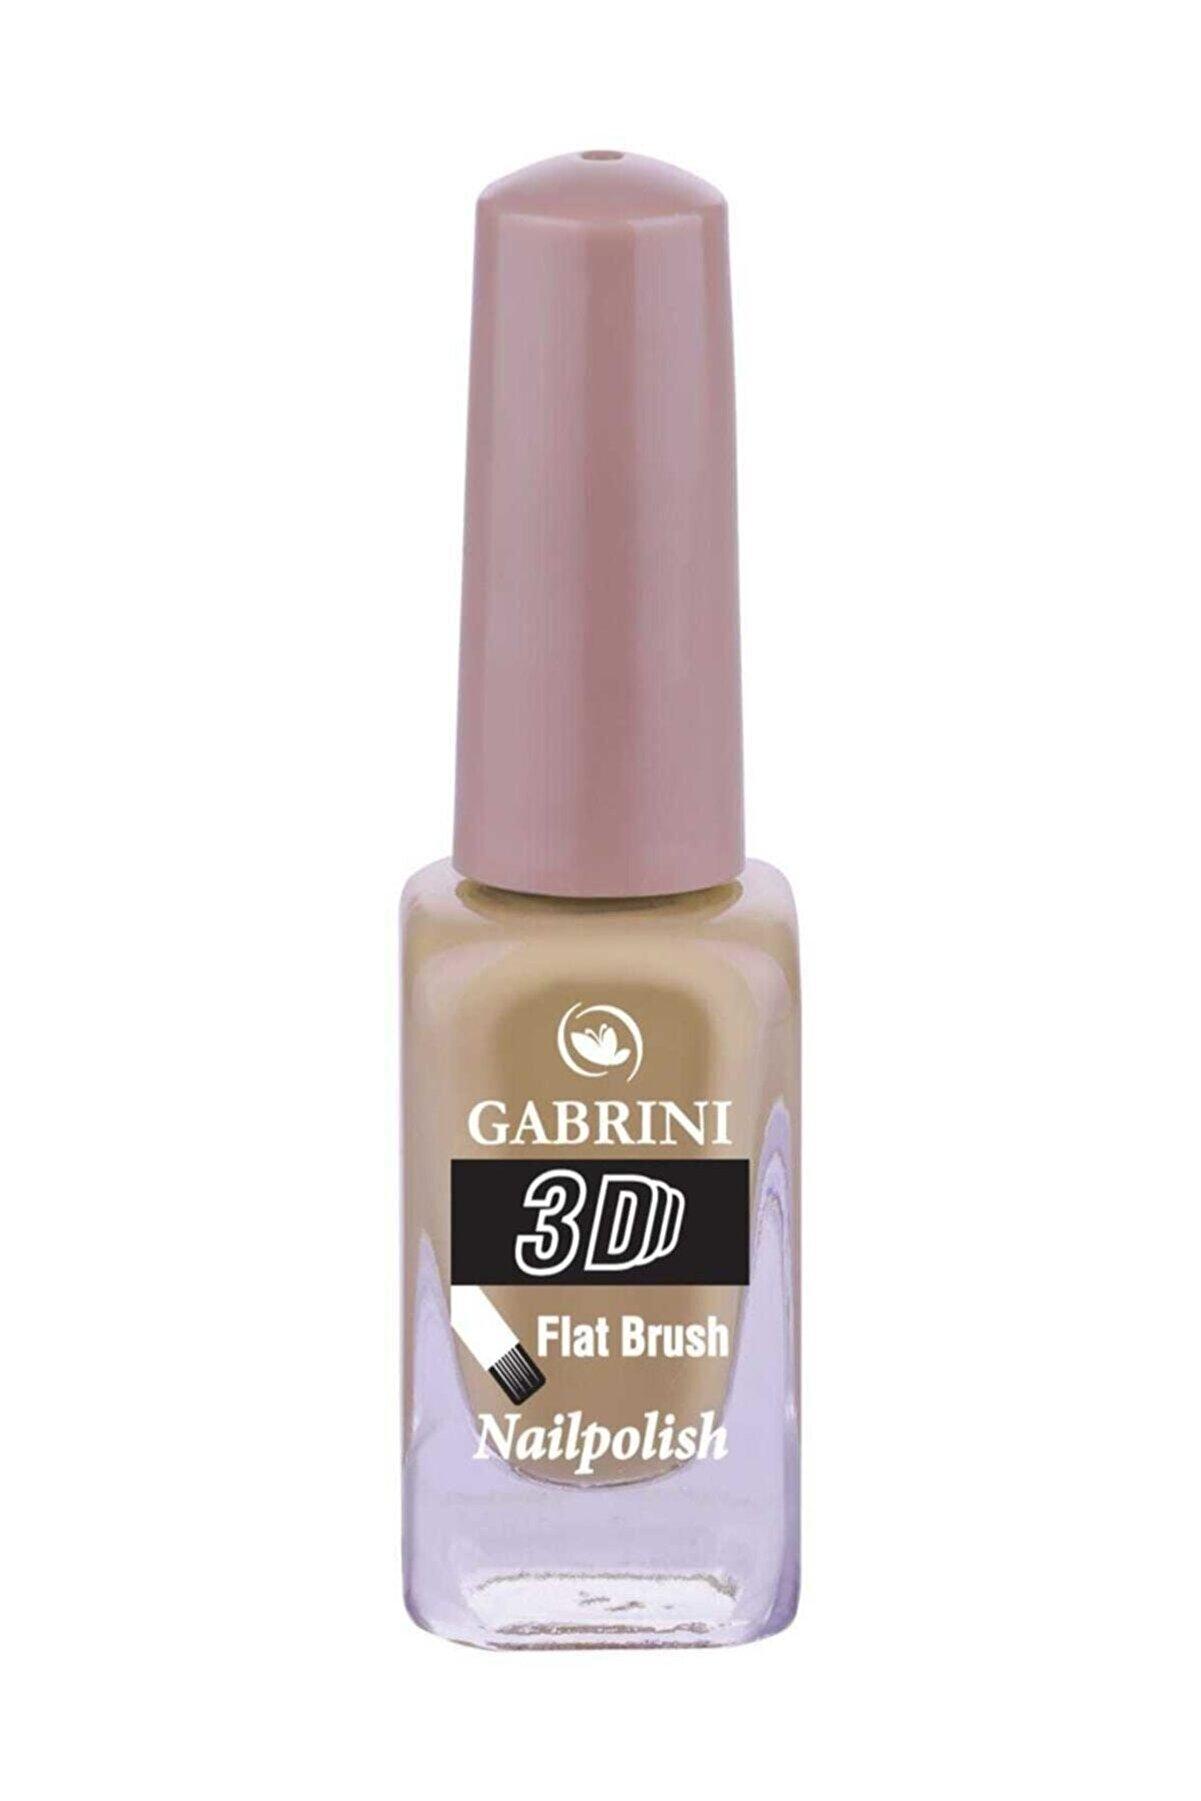 Shaka 07 Gabrini Oje - 3d Flat Brush Nailpolish (13 Ml )